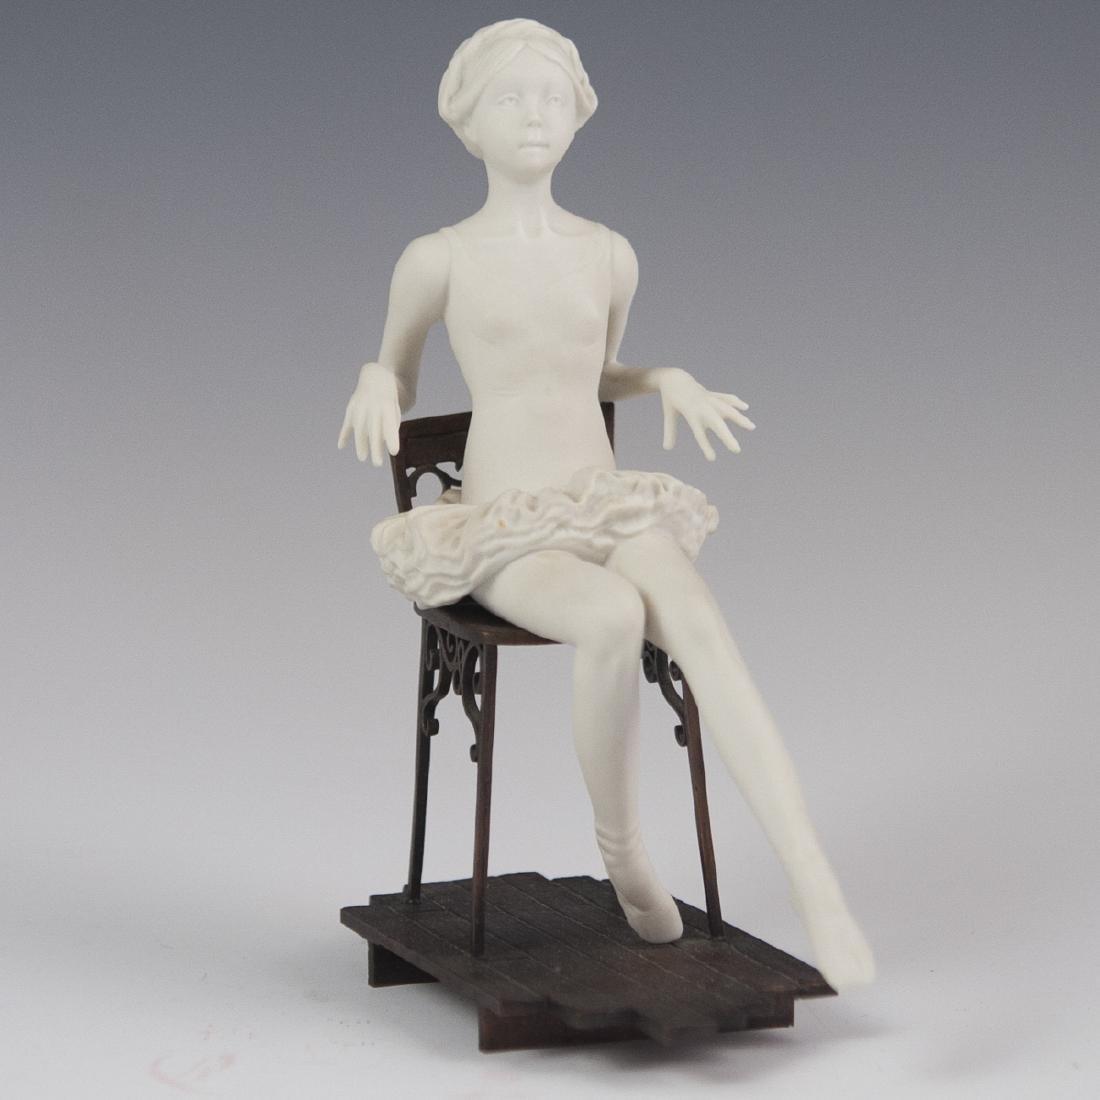 Boehm Porcelain Figurine